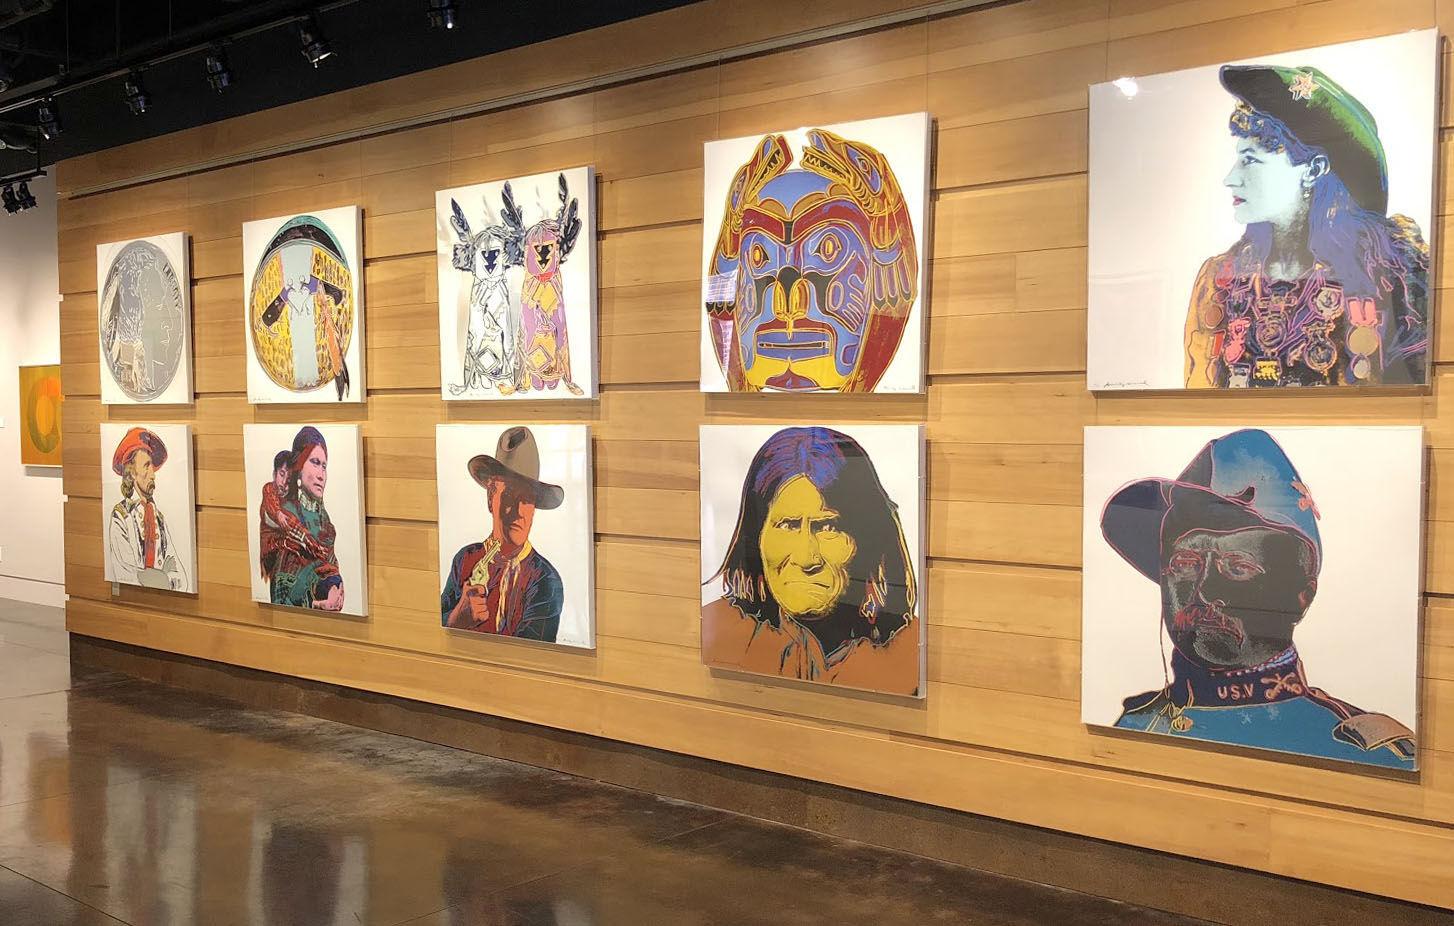 Andy Warholu0027s u201cCowboys and Indiansu201d series contrasts